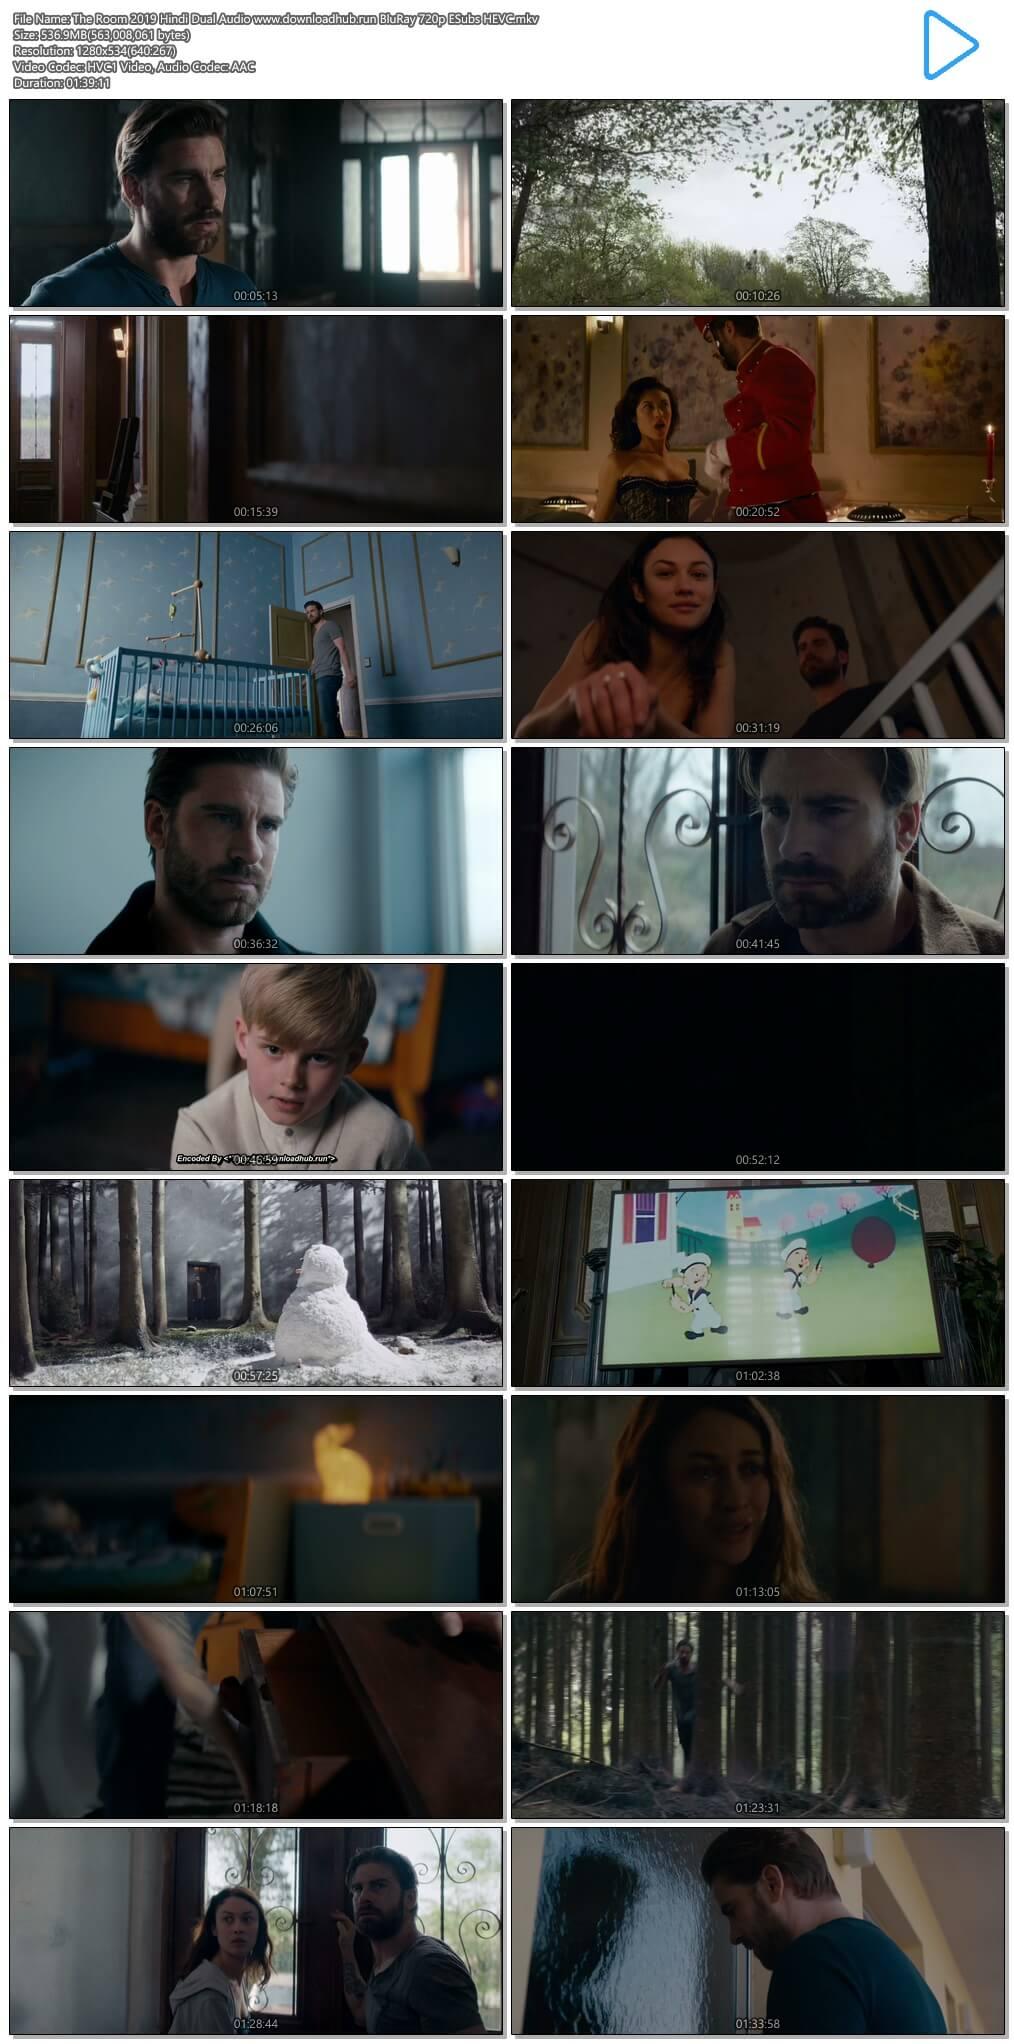 The Room 2019 Hindi Dual Audio 500MB BluRay 720p ESubs HEVC